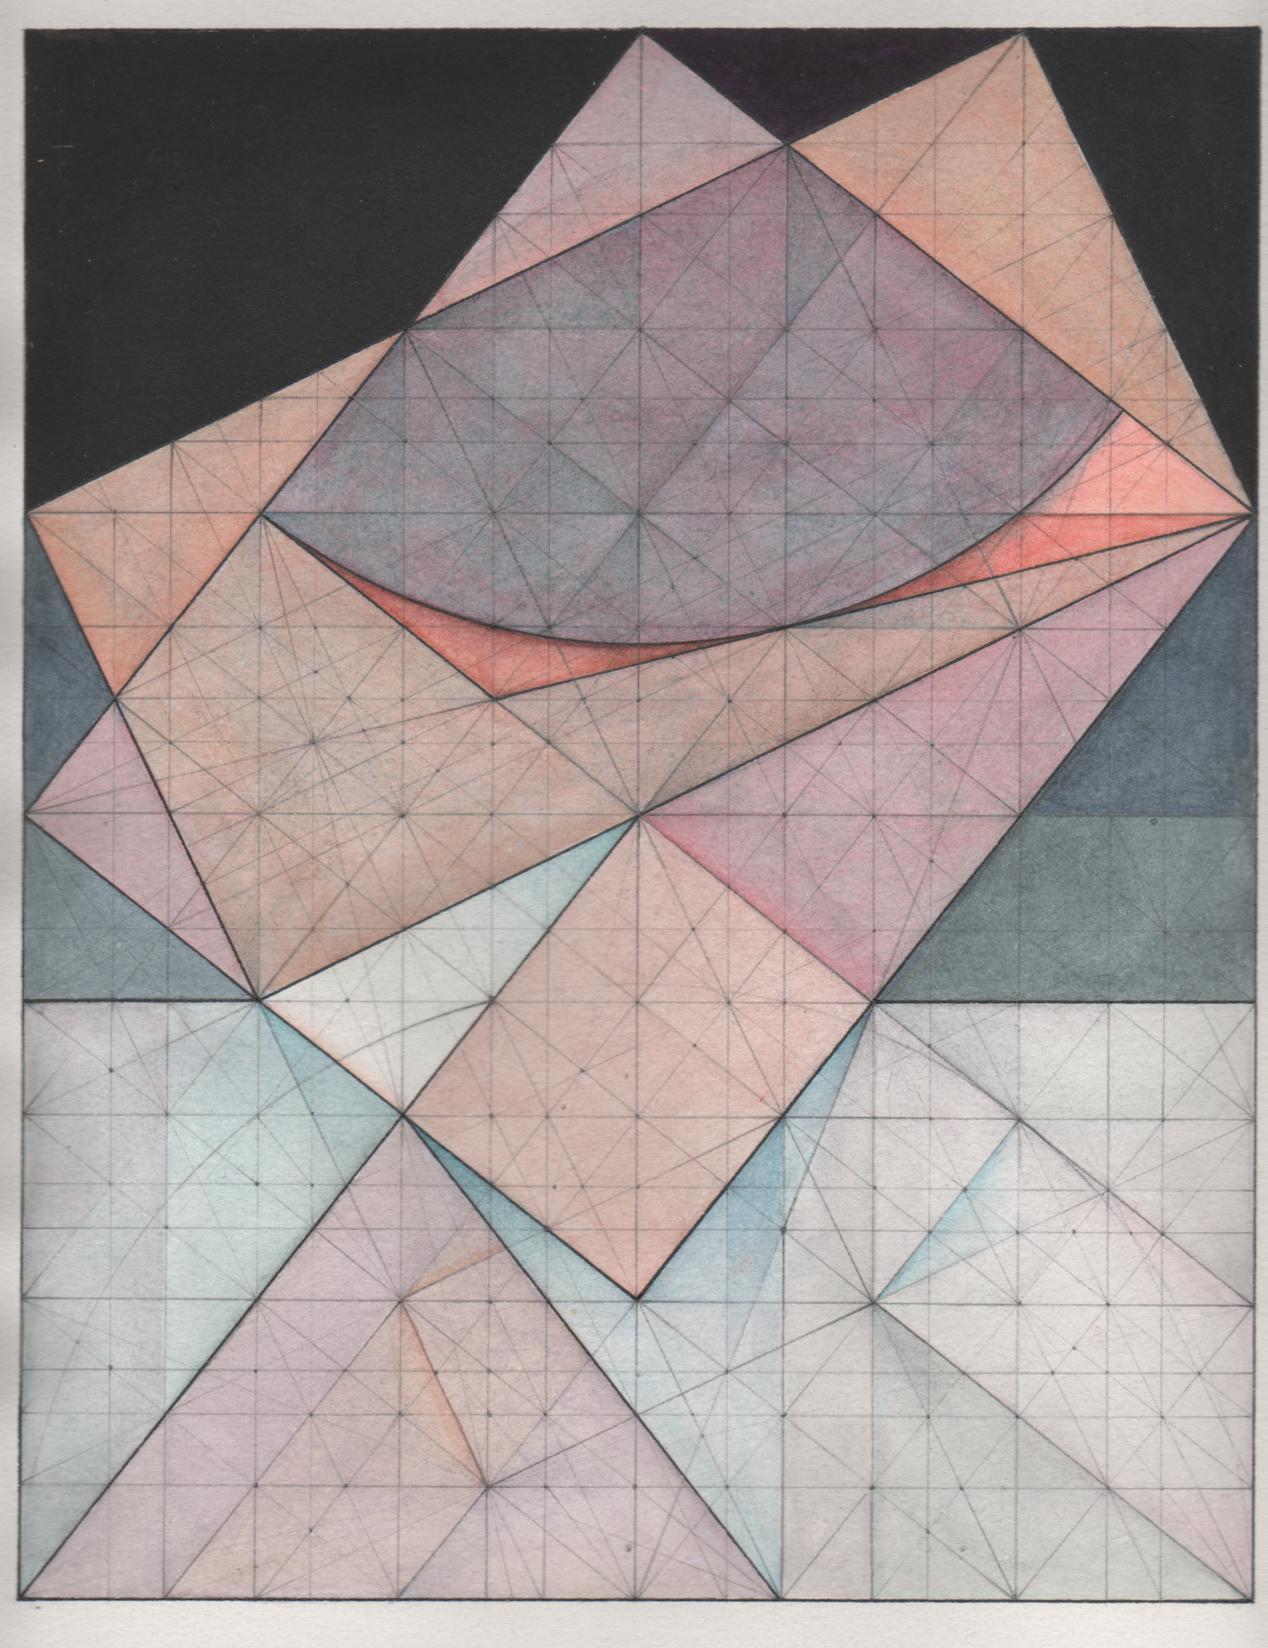 10 geometric art explorations for math learning - HD1268×1648